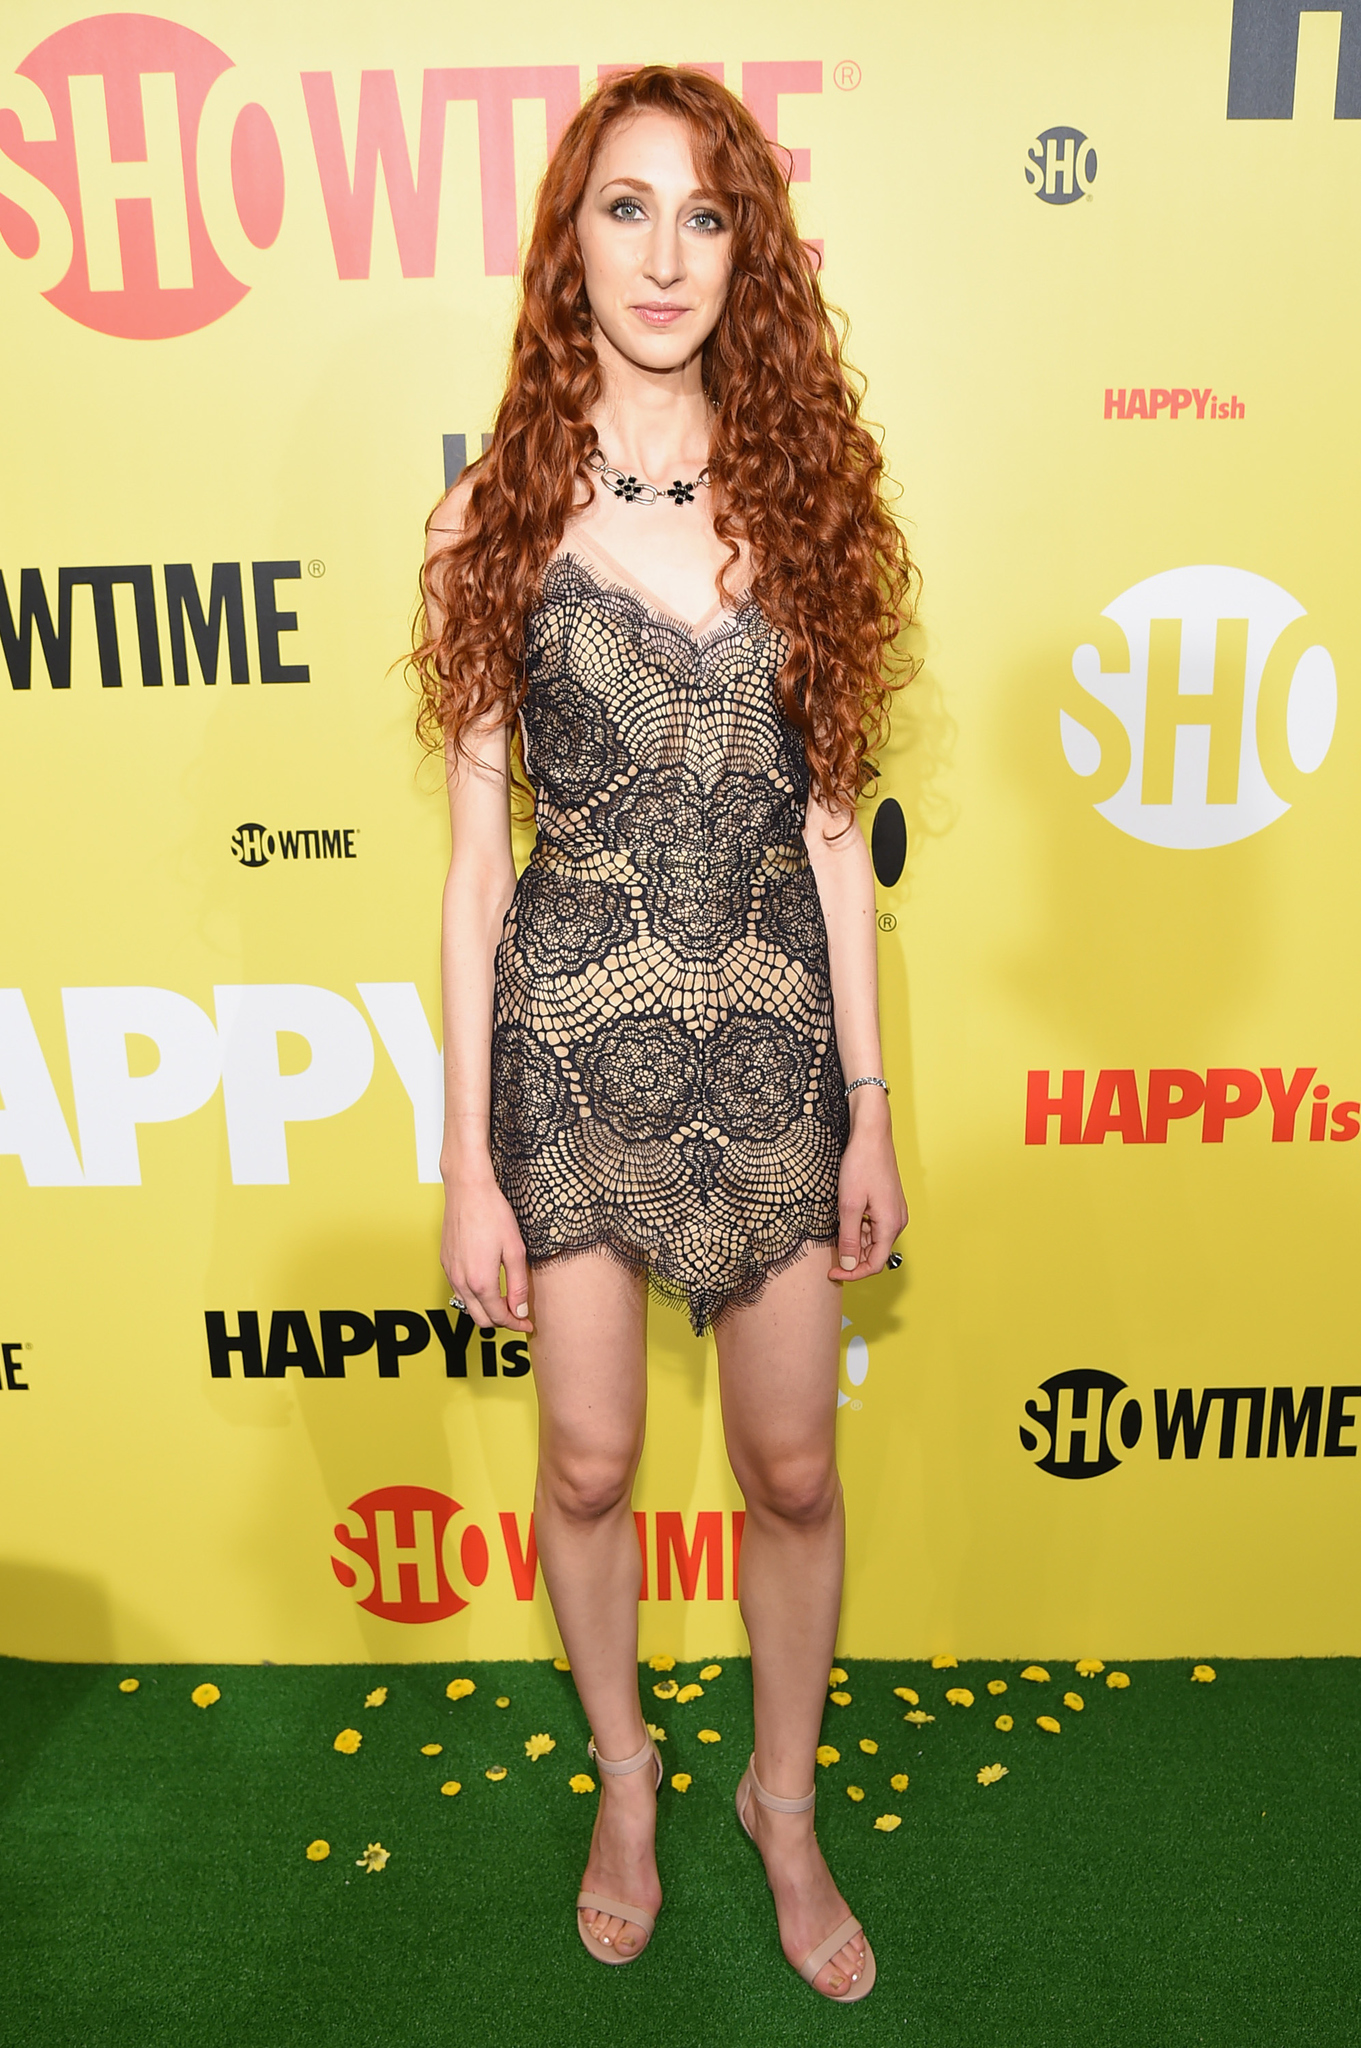 Lauren Culpepper at an event for Happyish (2015)